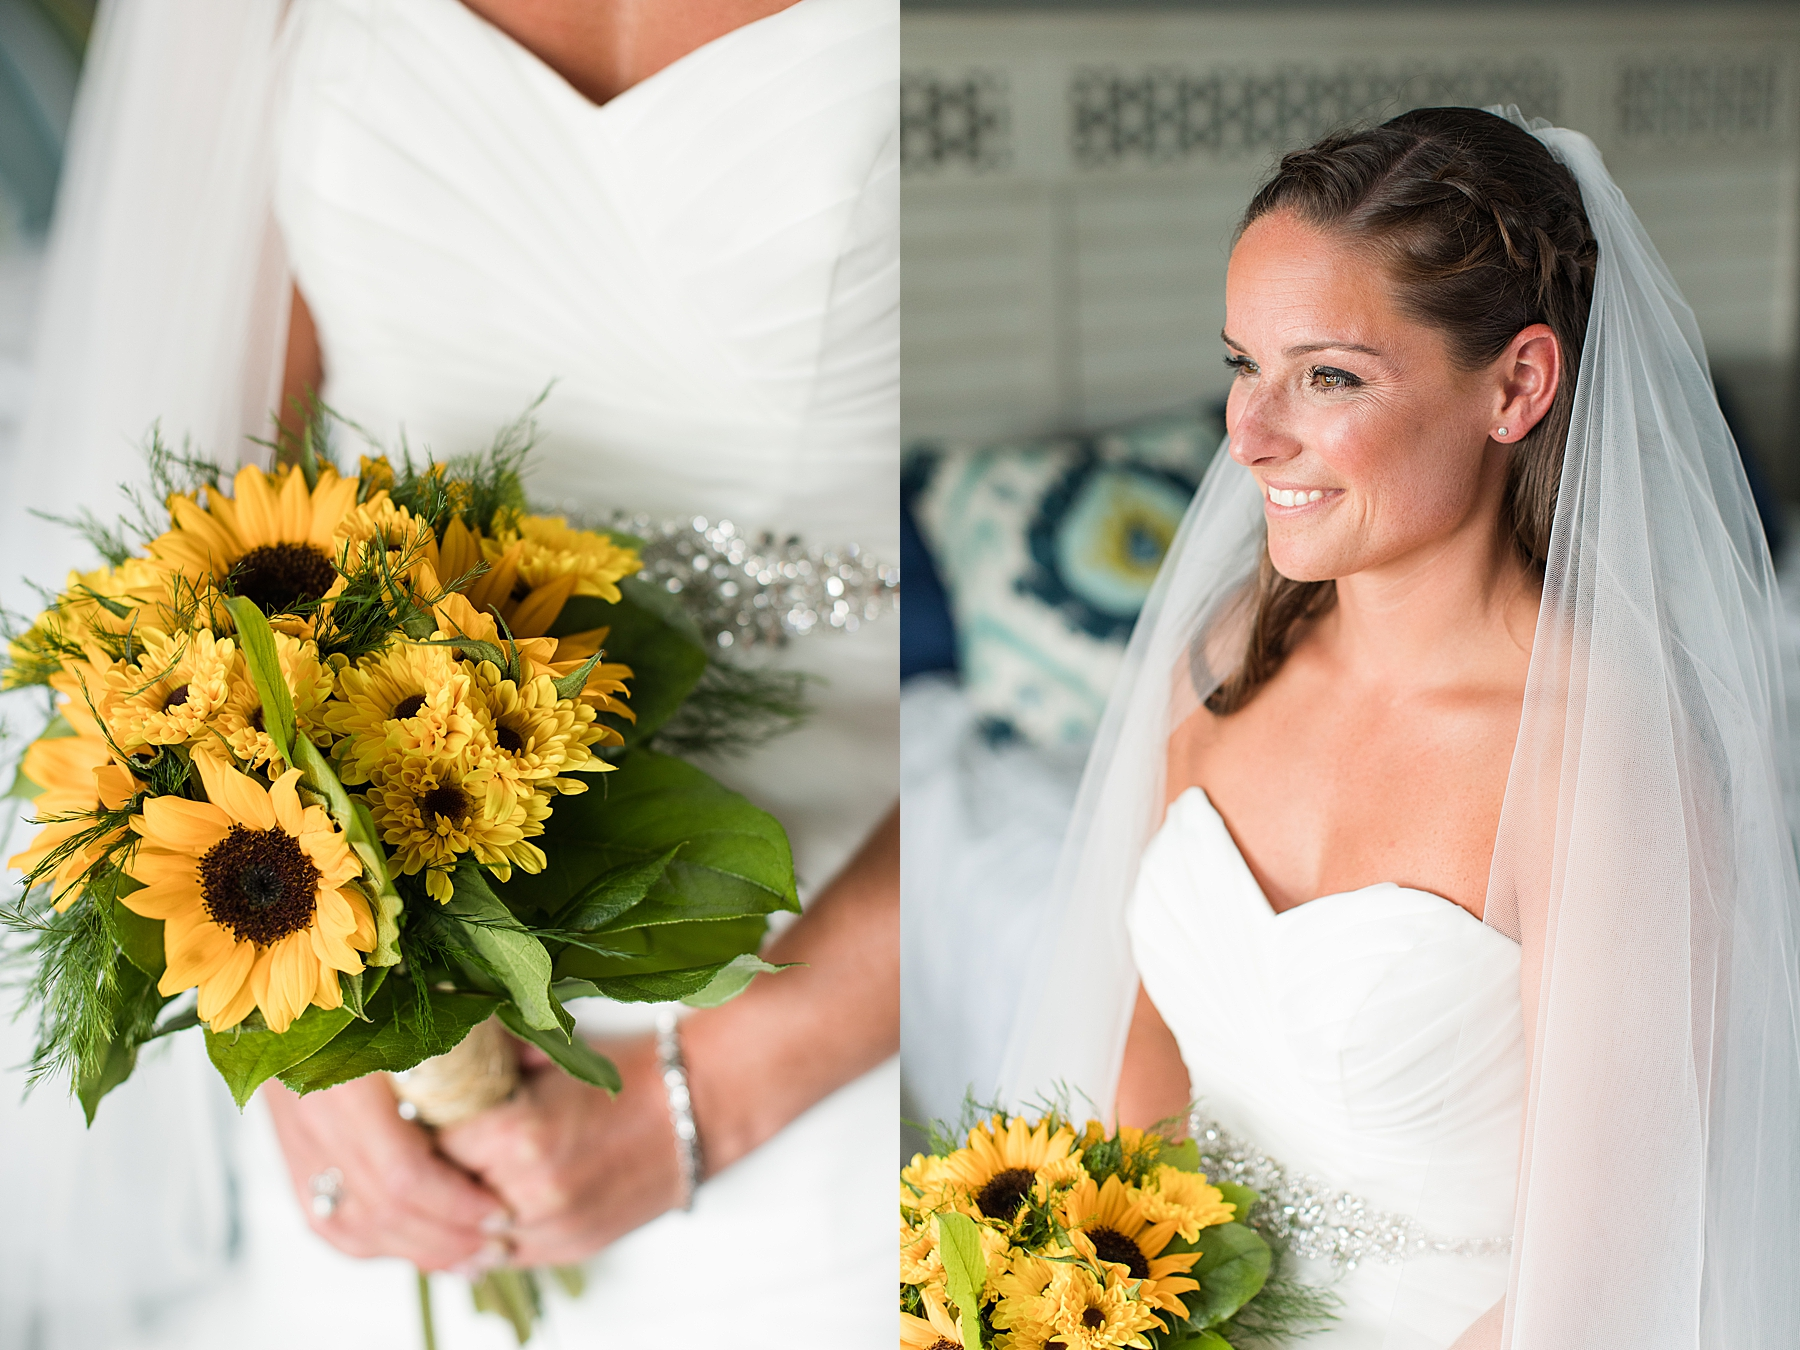 Wedding Photographer - Jessica & Tom